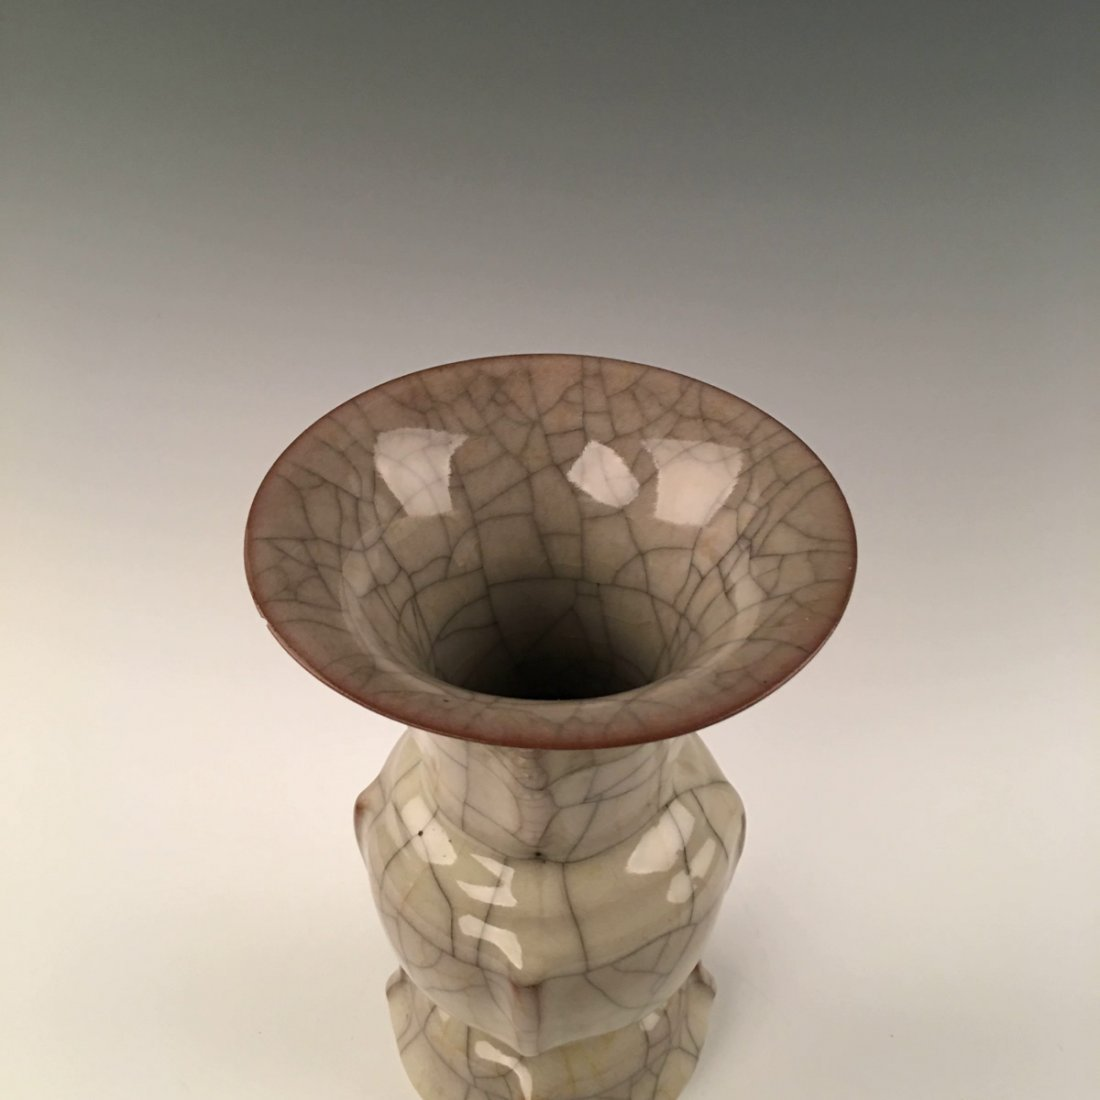 Chinese Guan-Ware Porcelain Gu-Shaped Vase - 2